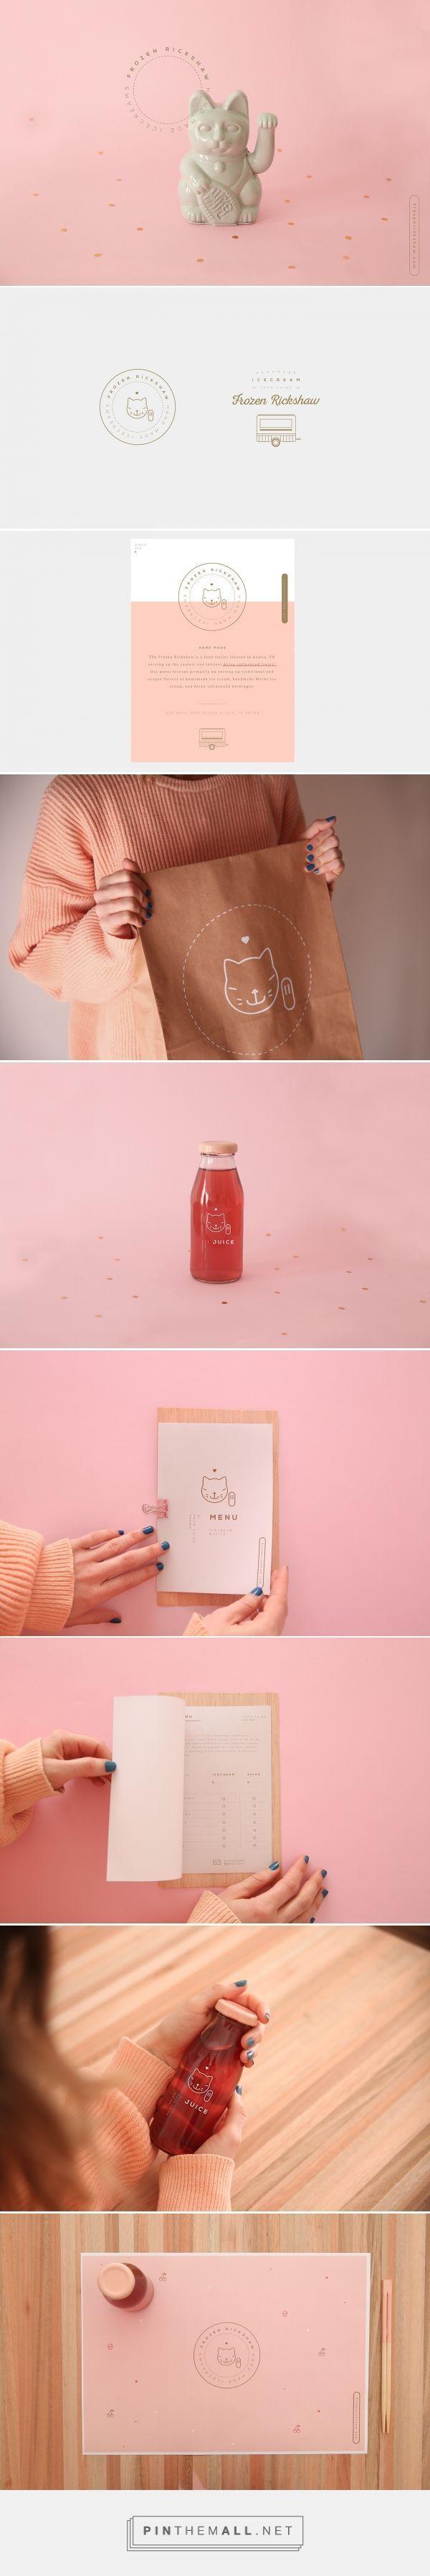 Frozen Rickshaw Branding by Un Barco on Behance | Fivestar Branding – Design and Branding Agency & Inspiration Gallery